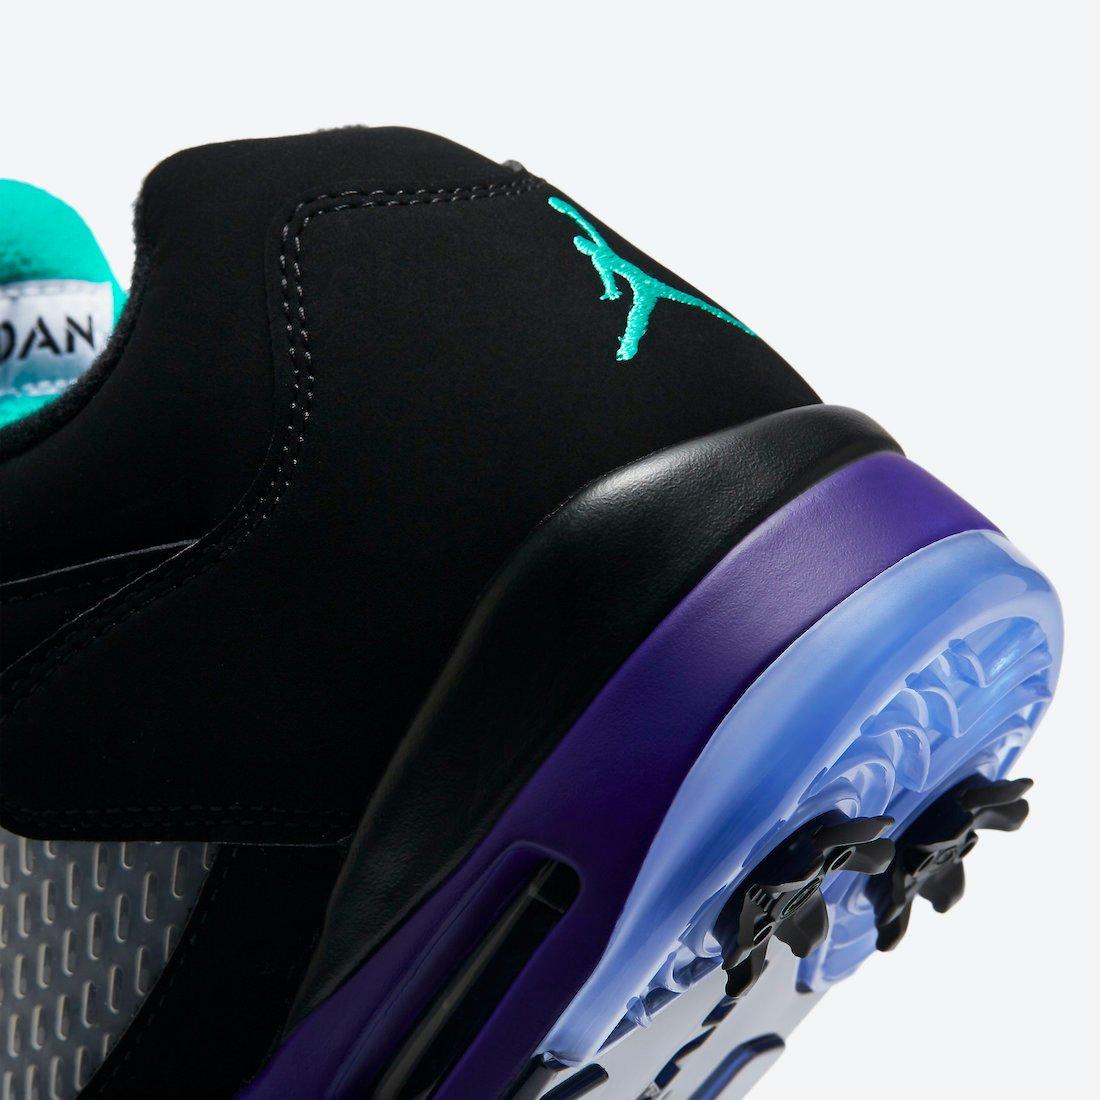 Air Jordan 5 Low Golf Black Grape CU4523-001 Release Date